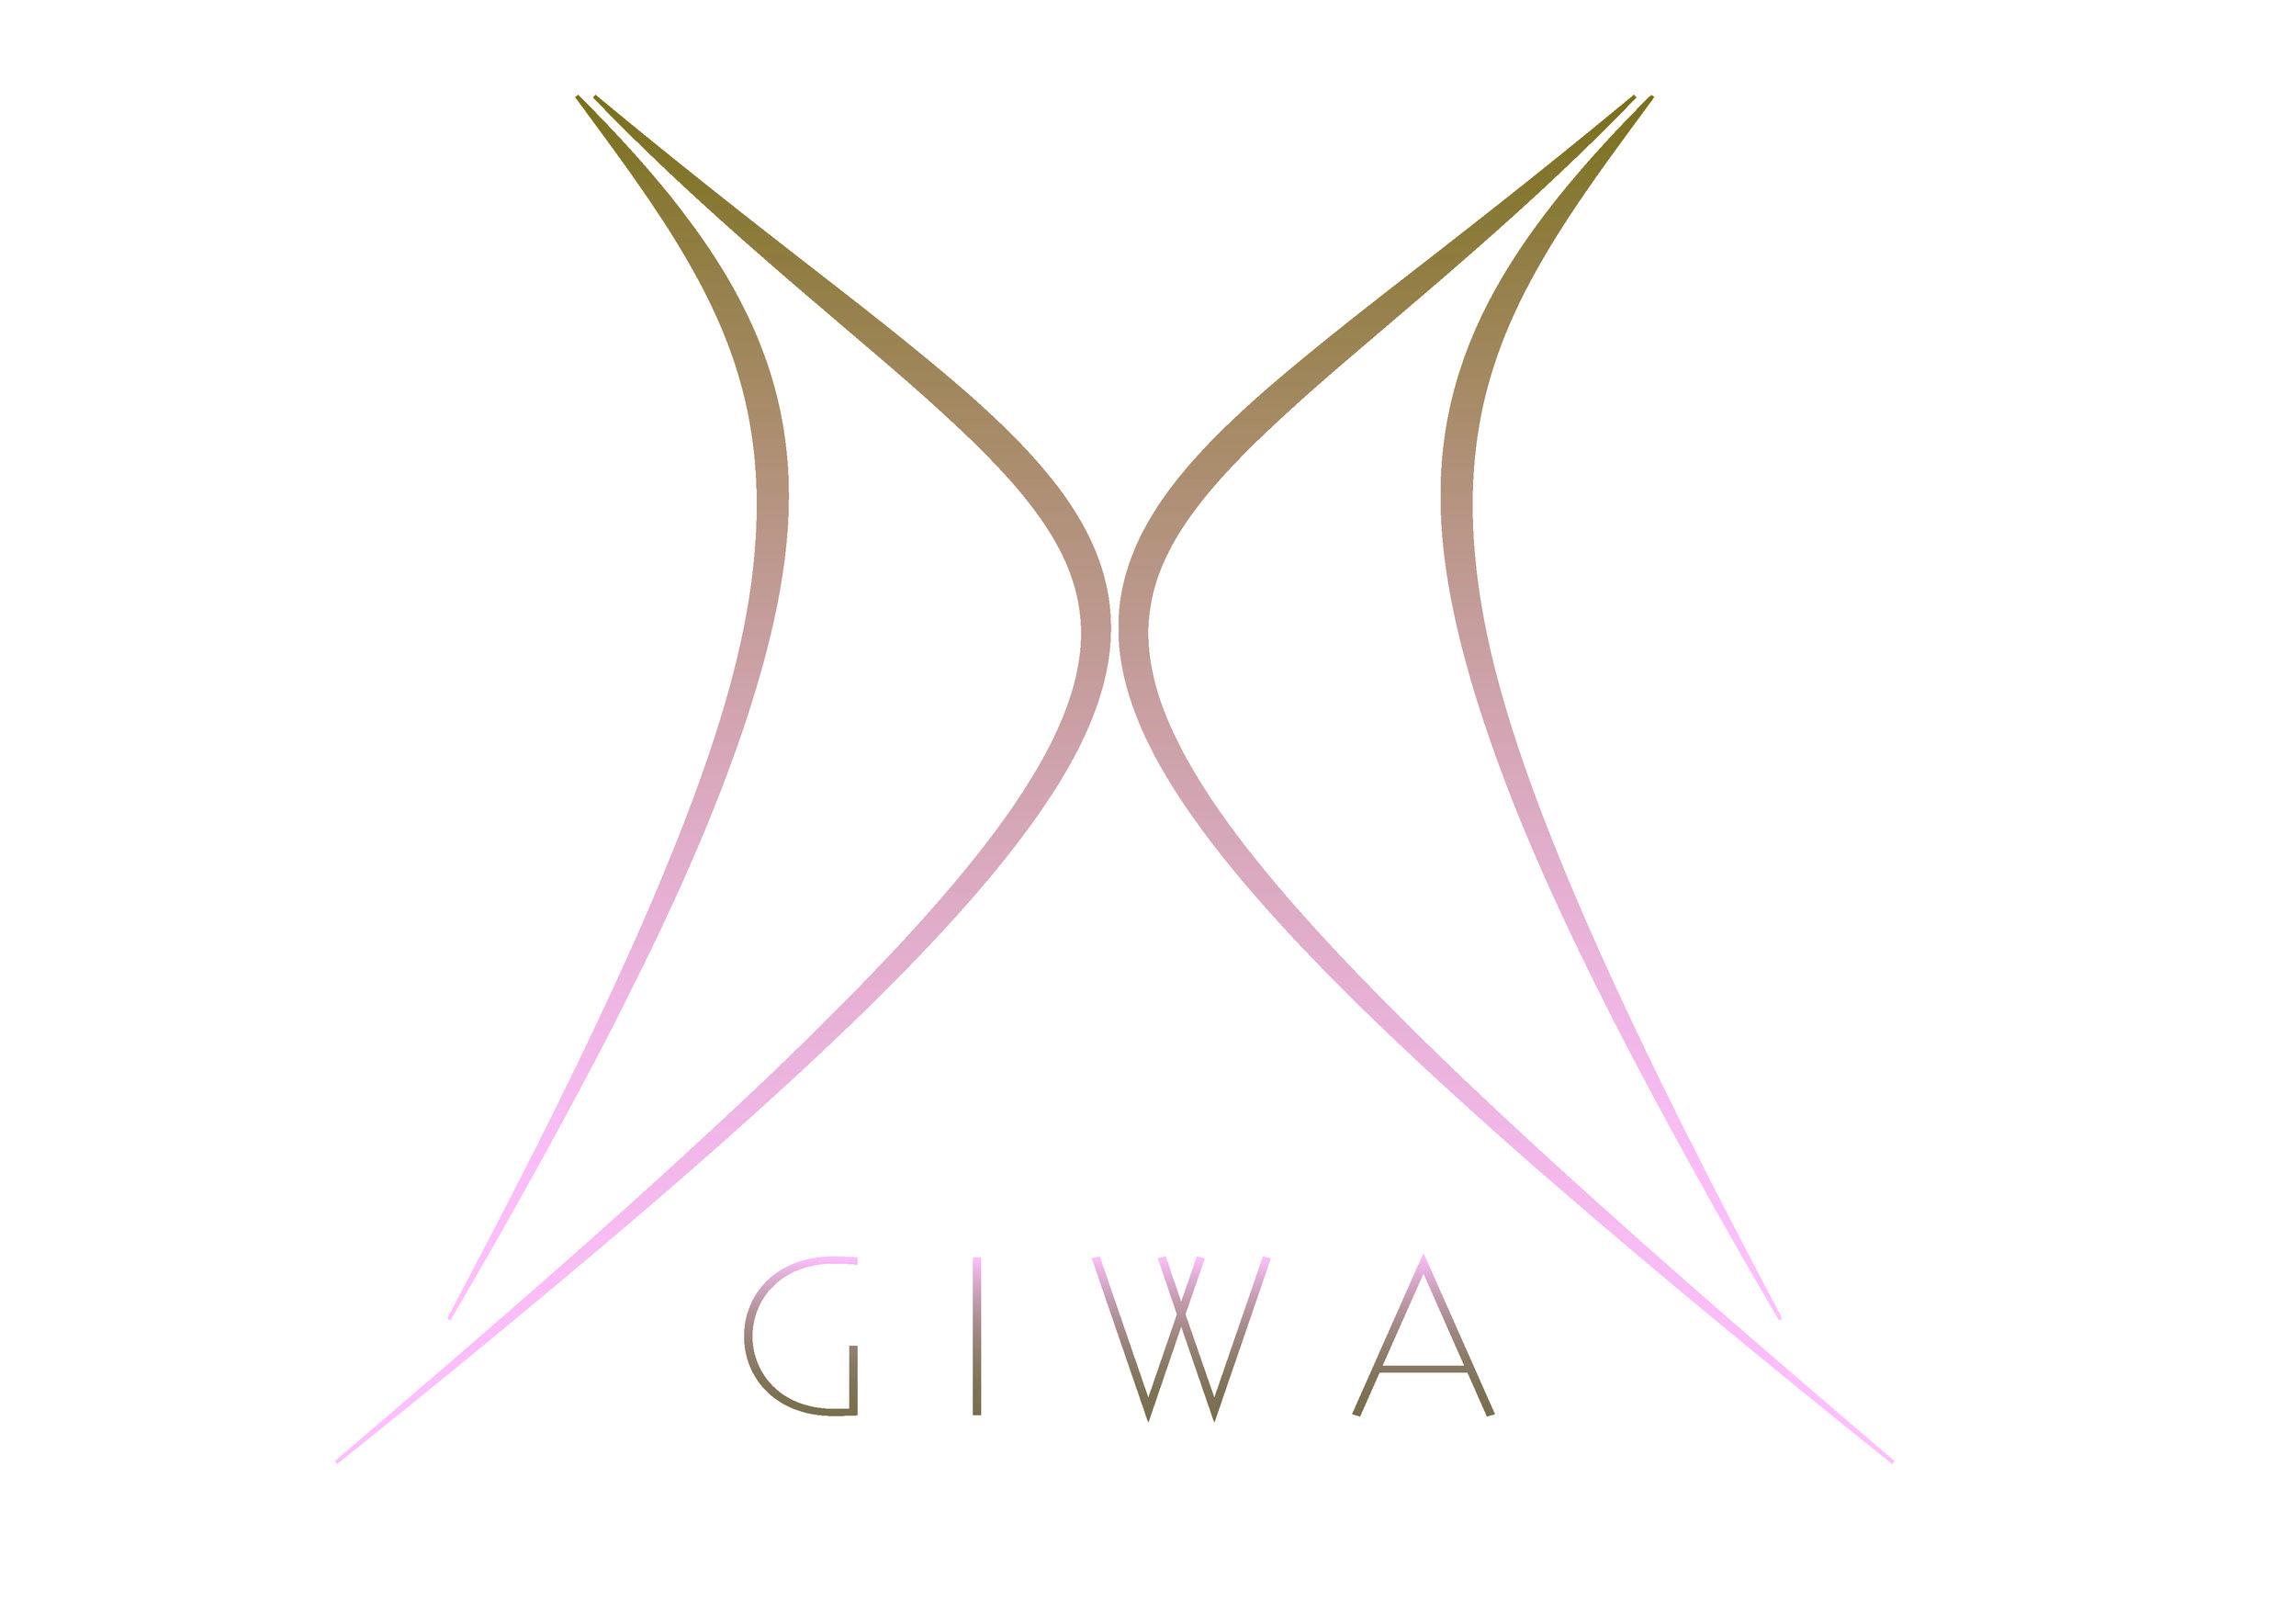 GIWA_LOGO_design.jpg